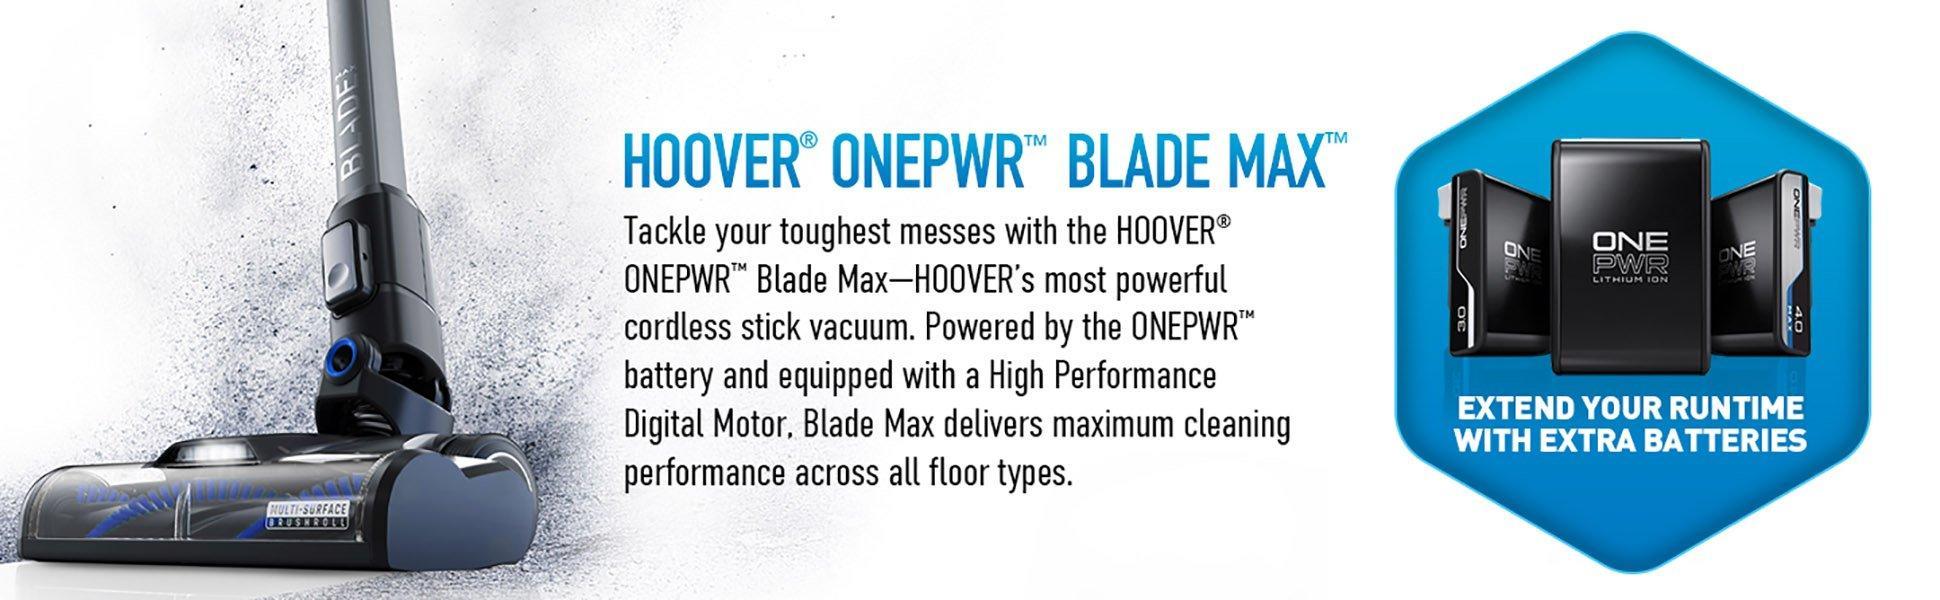 ONEPWR Blade